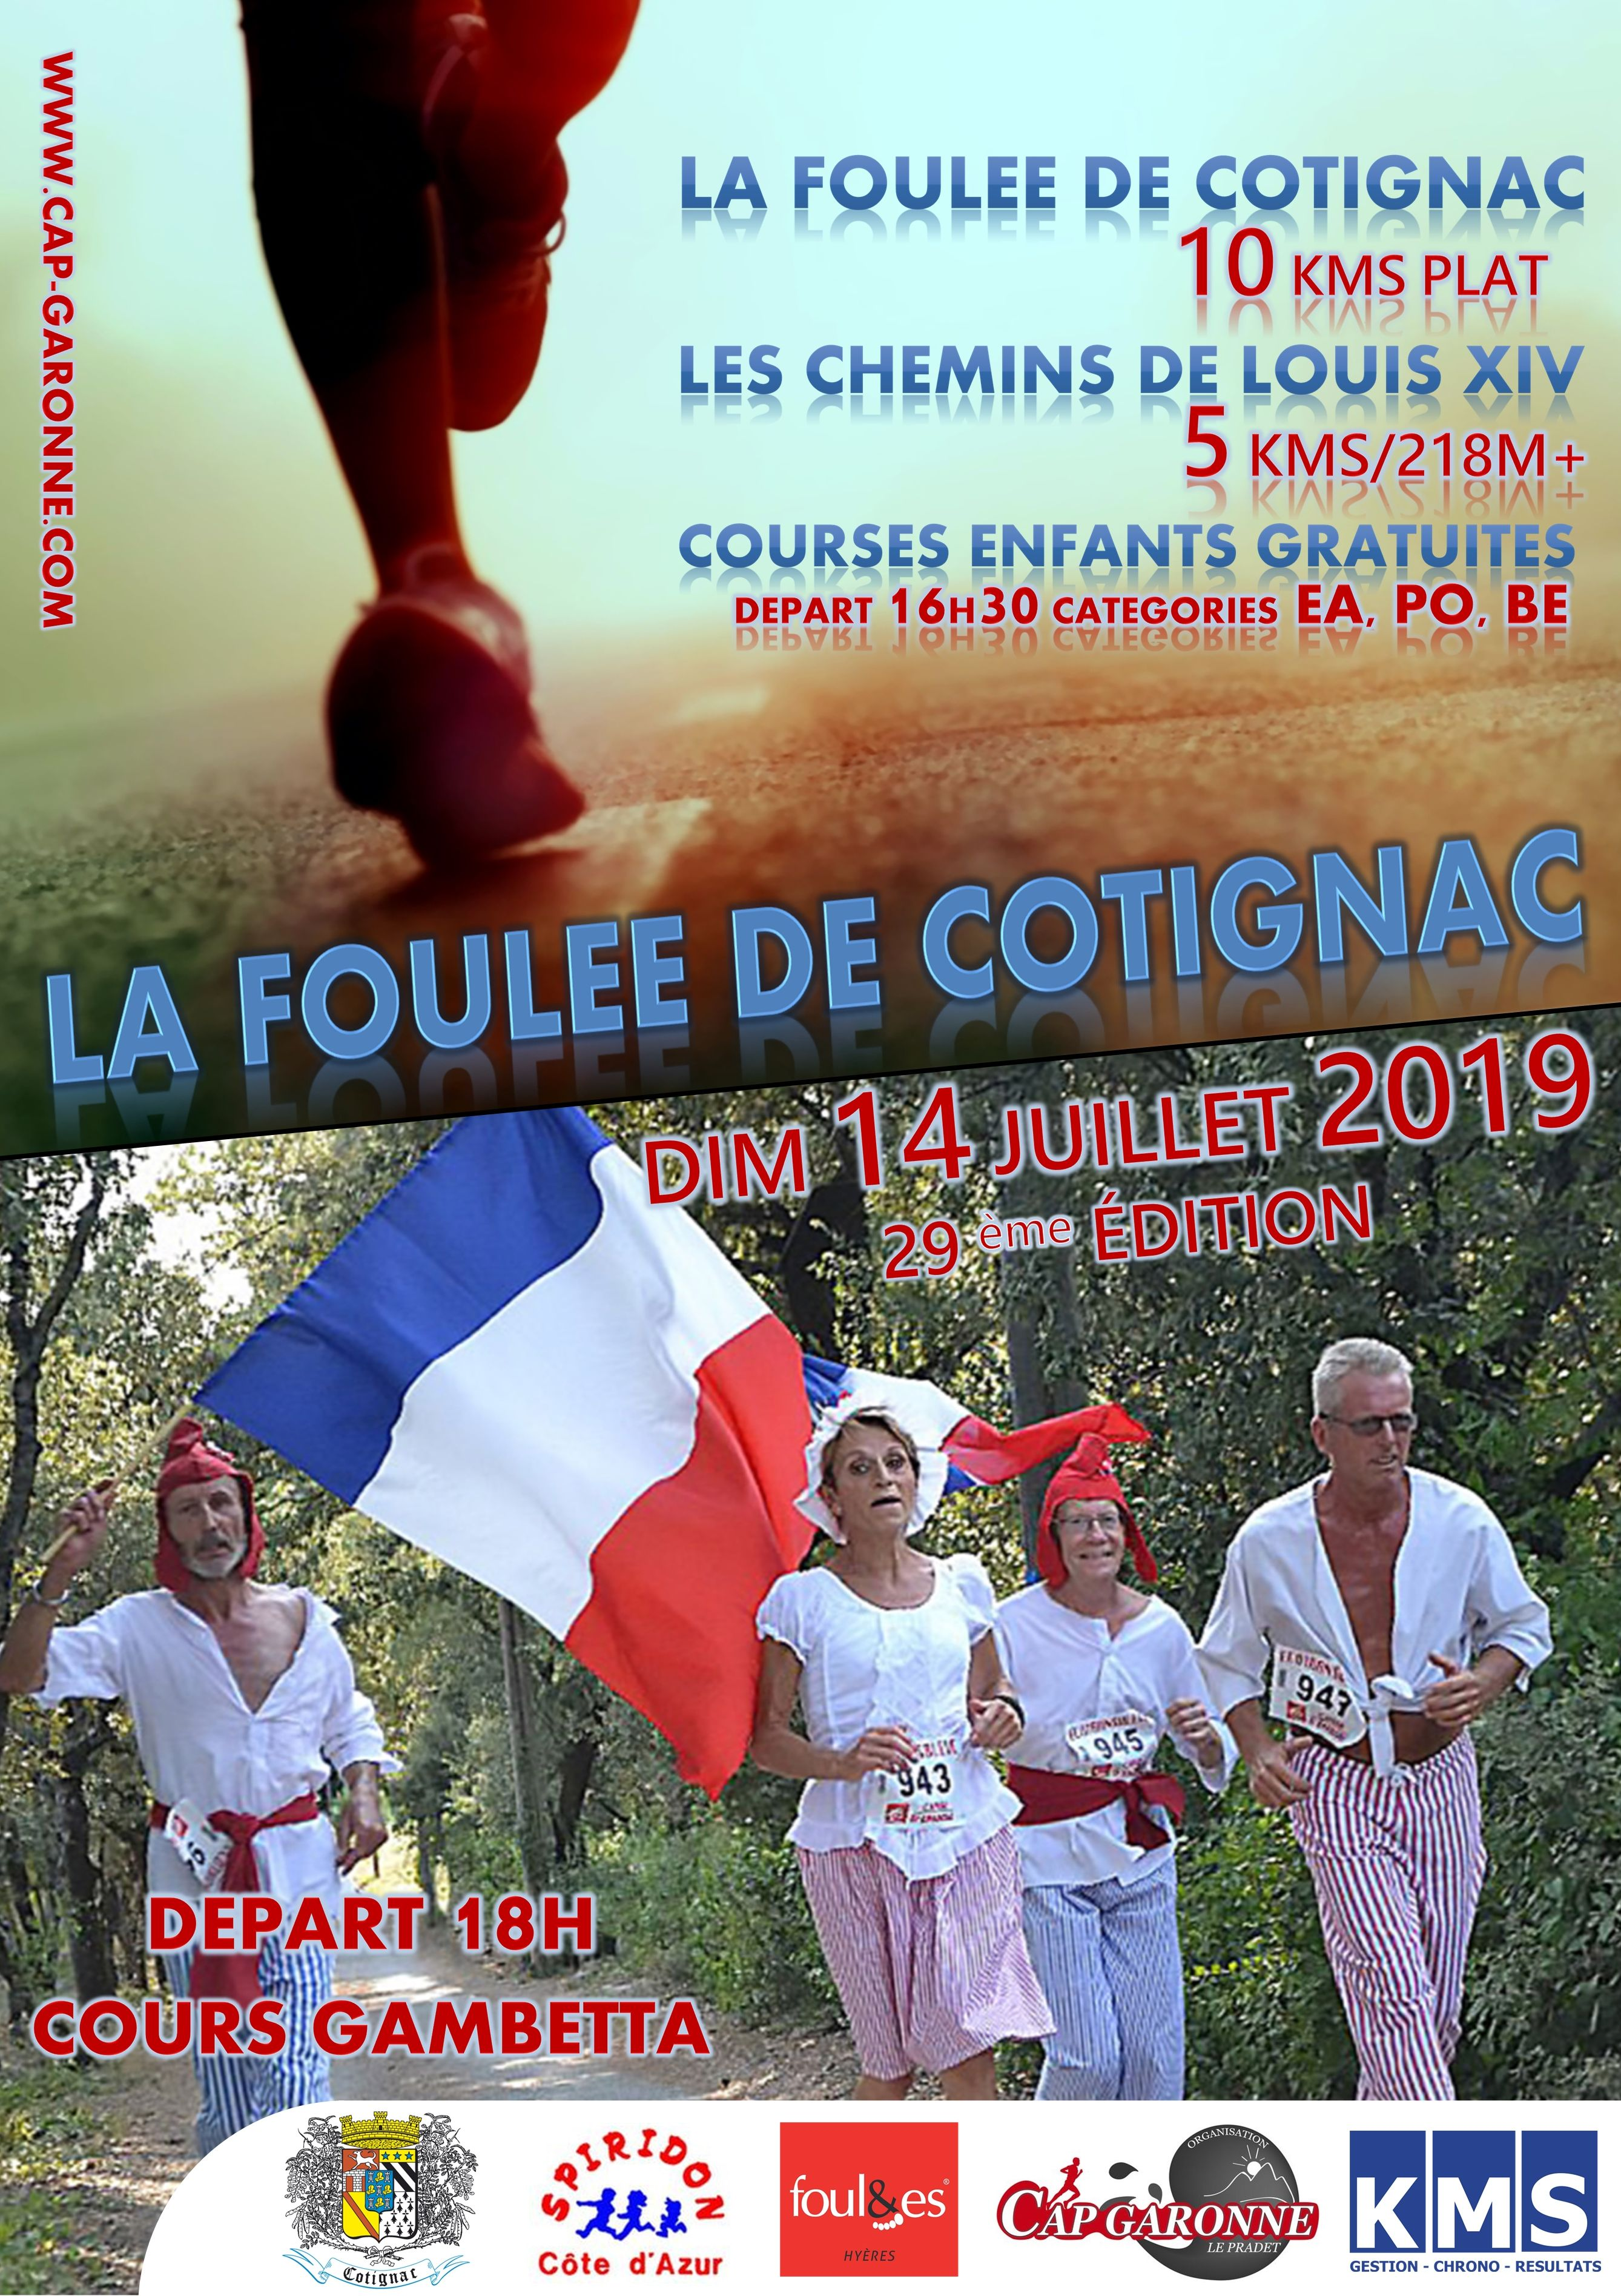 Foulee de Cotignac - 10 km